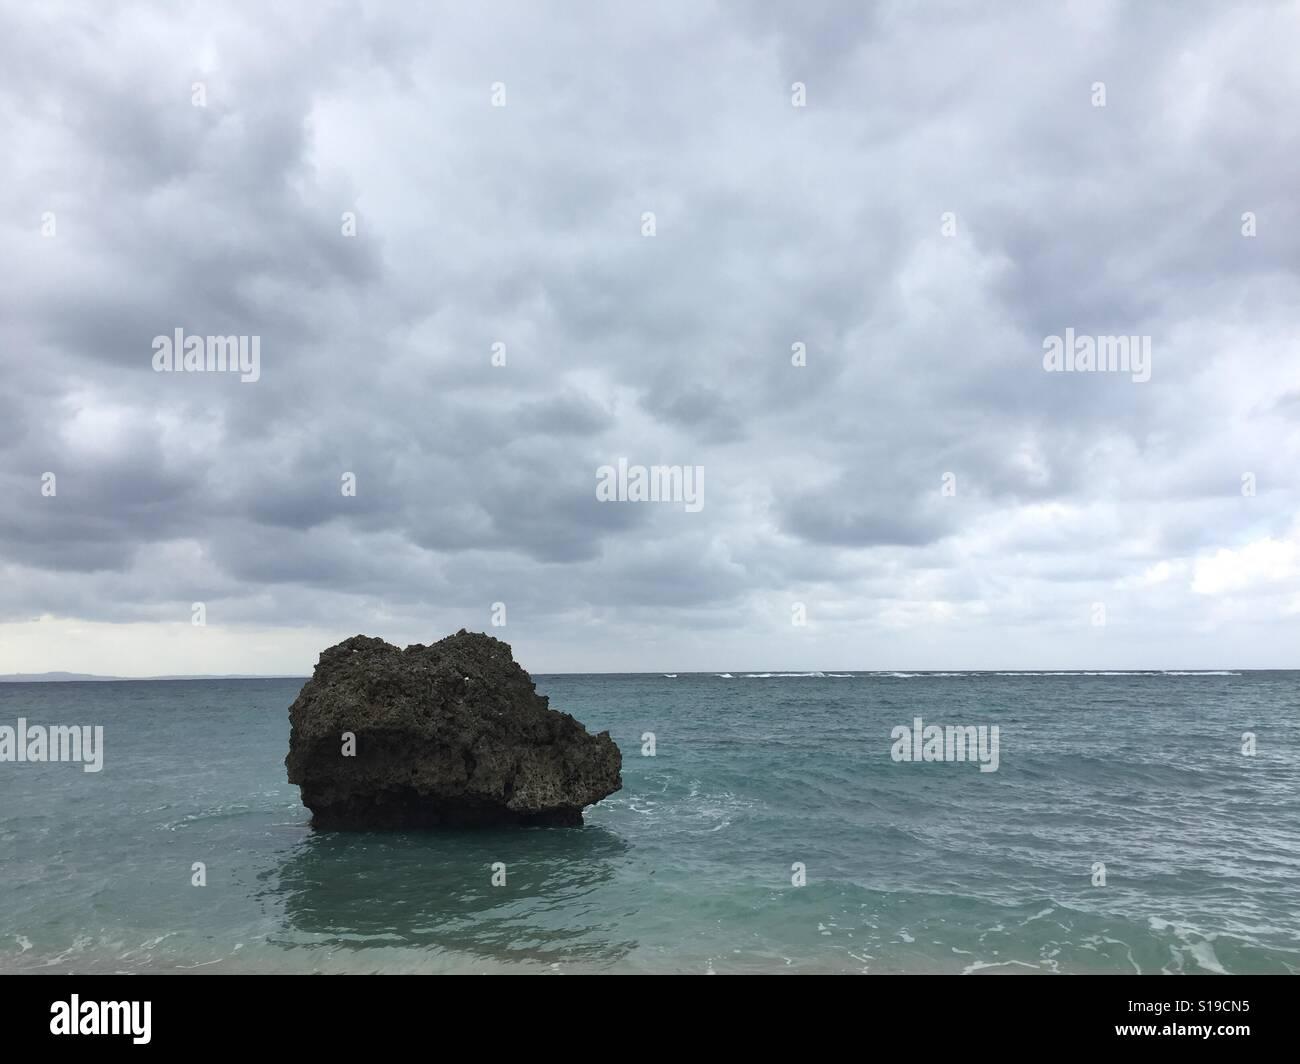 Beach Rock in Okinawa Japan - Stock Image